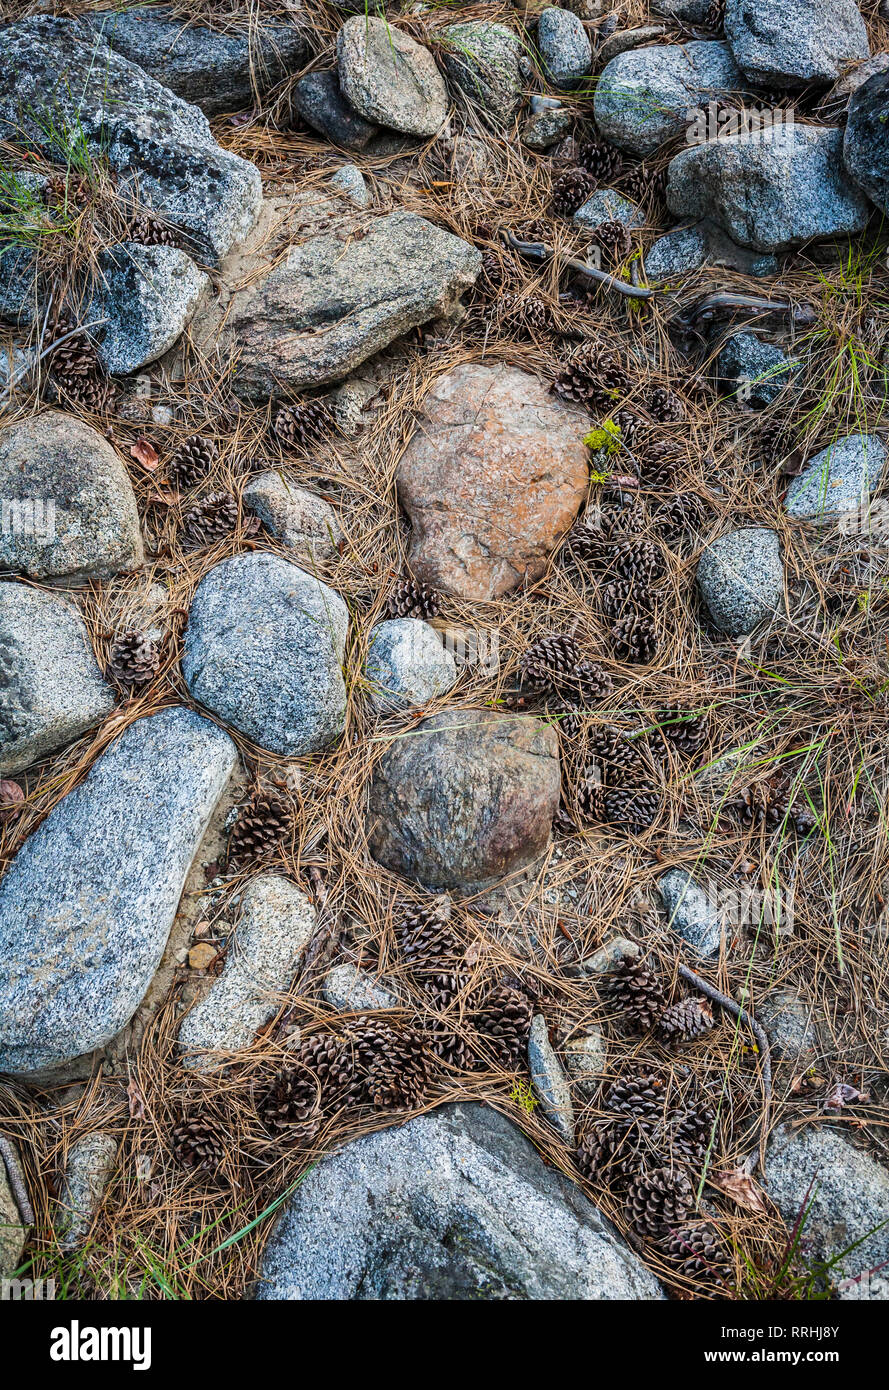 Pine needles and pine cones lying among the rocks and sticks on the ground.  Washington Cascades, USA. - Stock Image